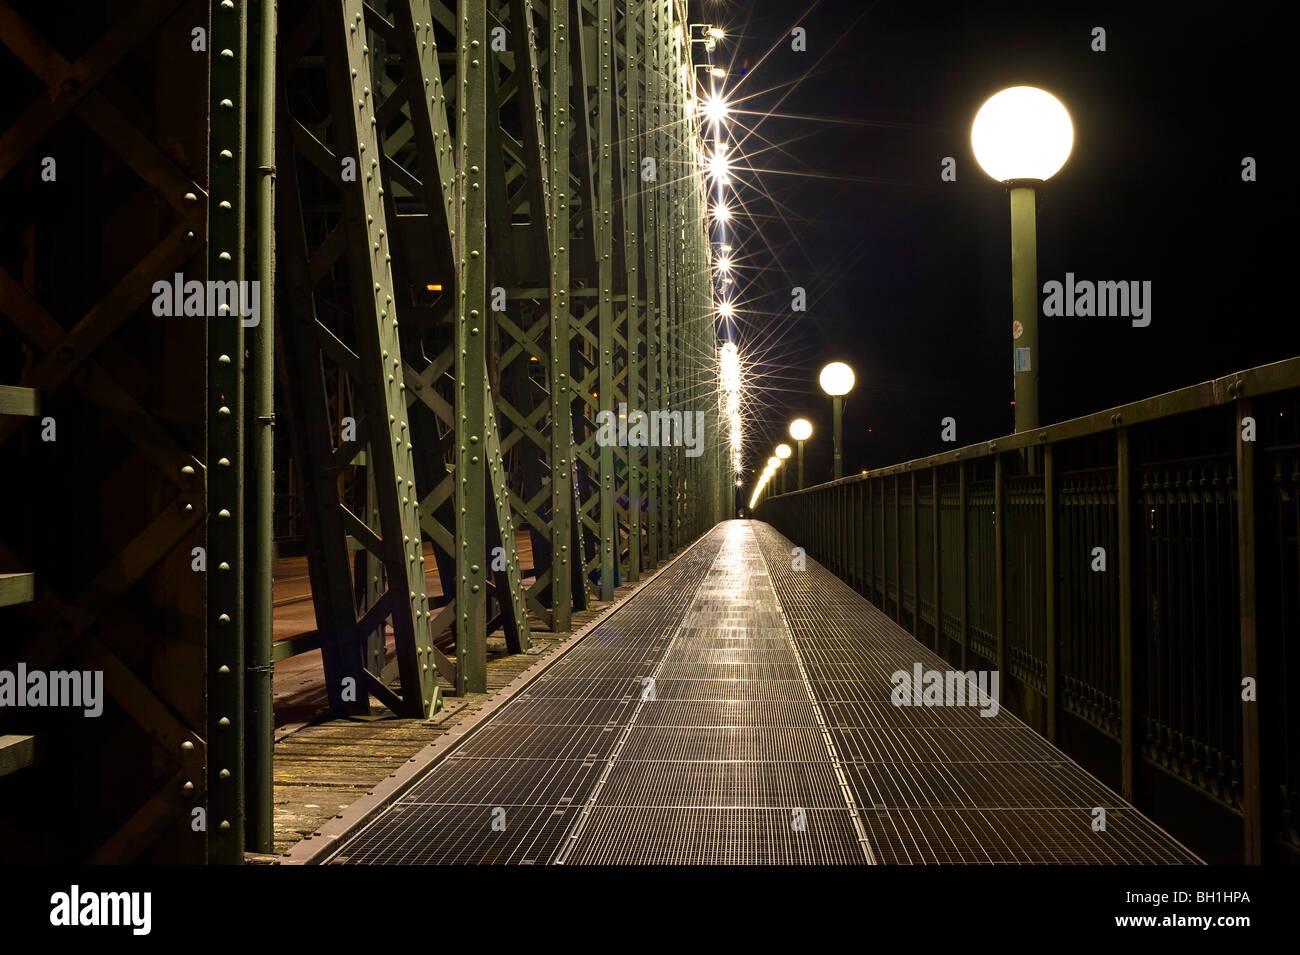 Deserted railway bridge and street lamp at night, Linz, Upper Austria, Austria - Stock Image